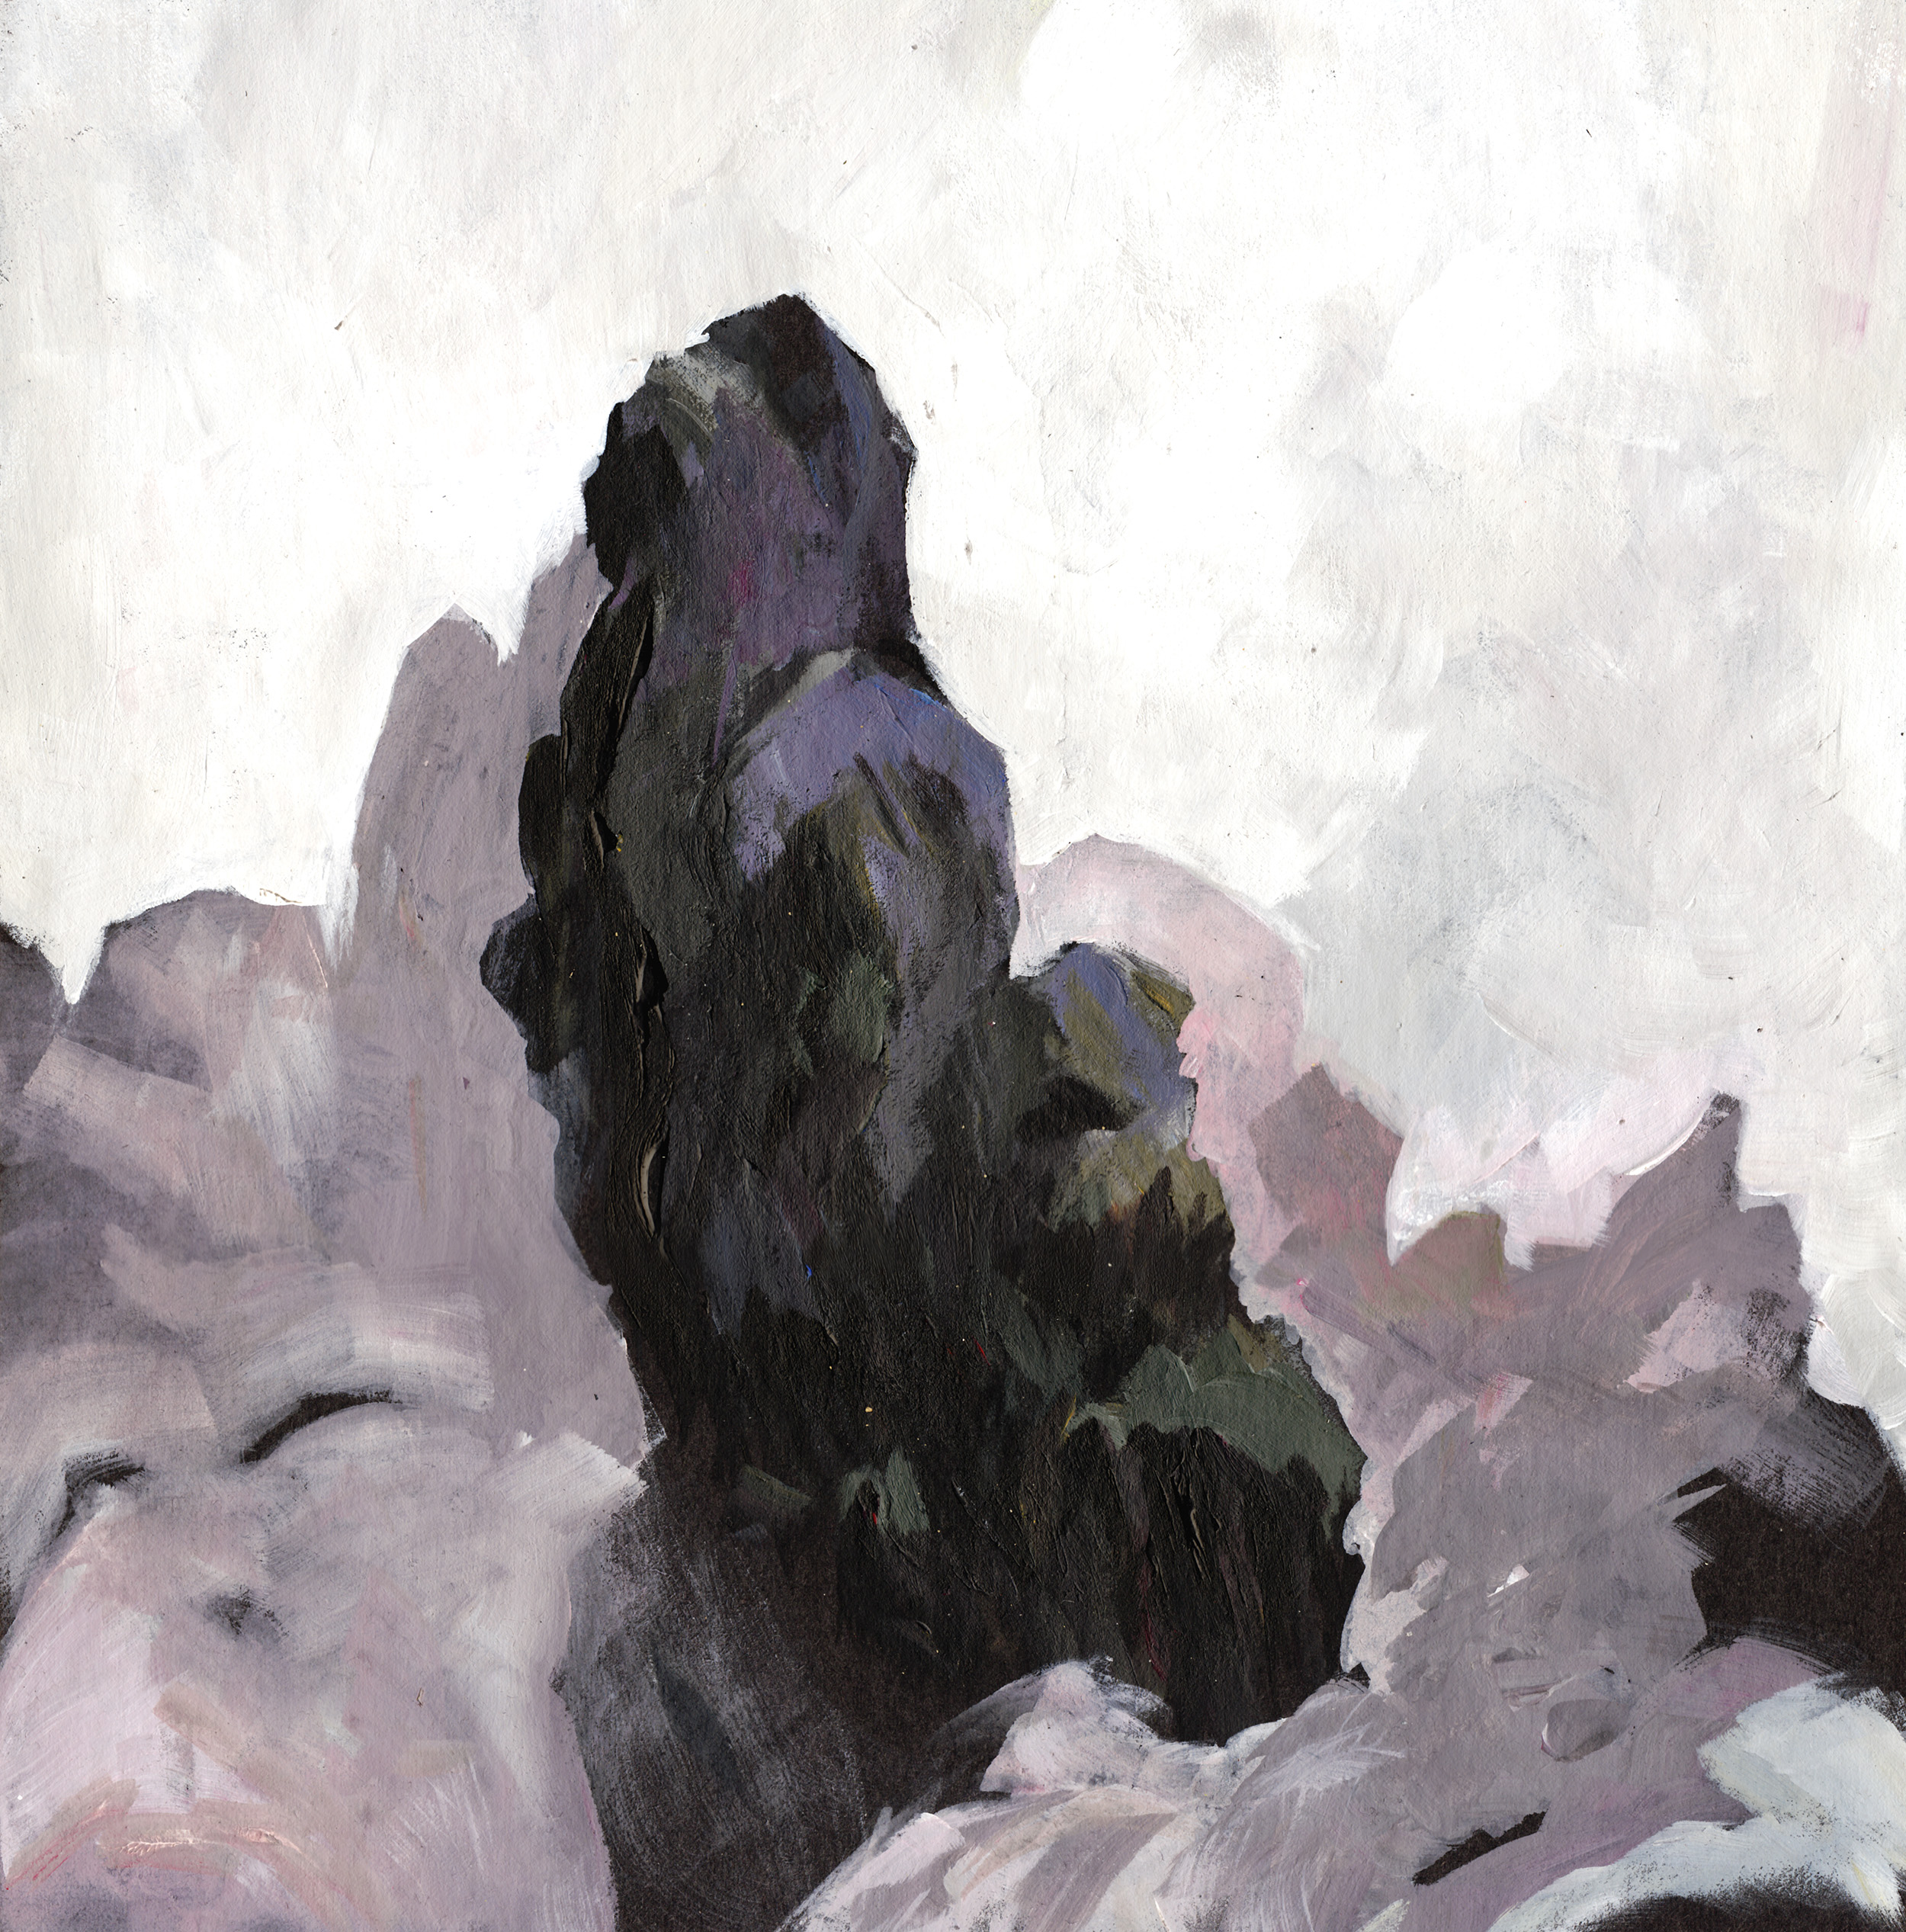 Painting: Rocks